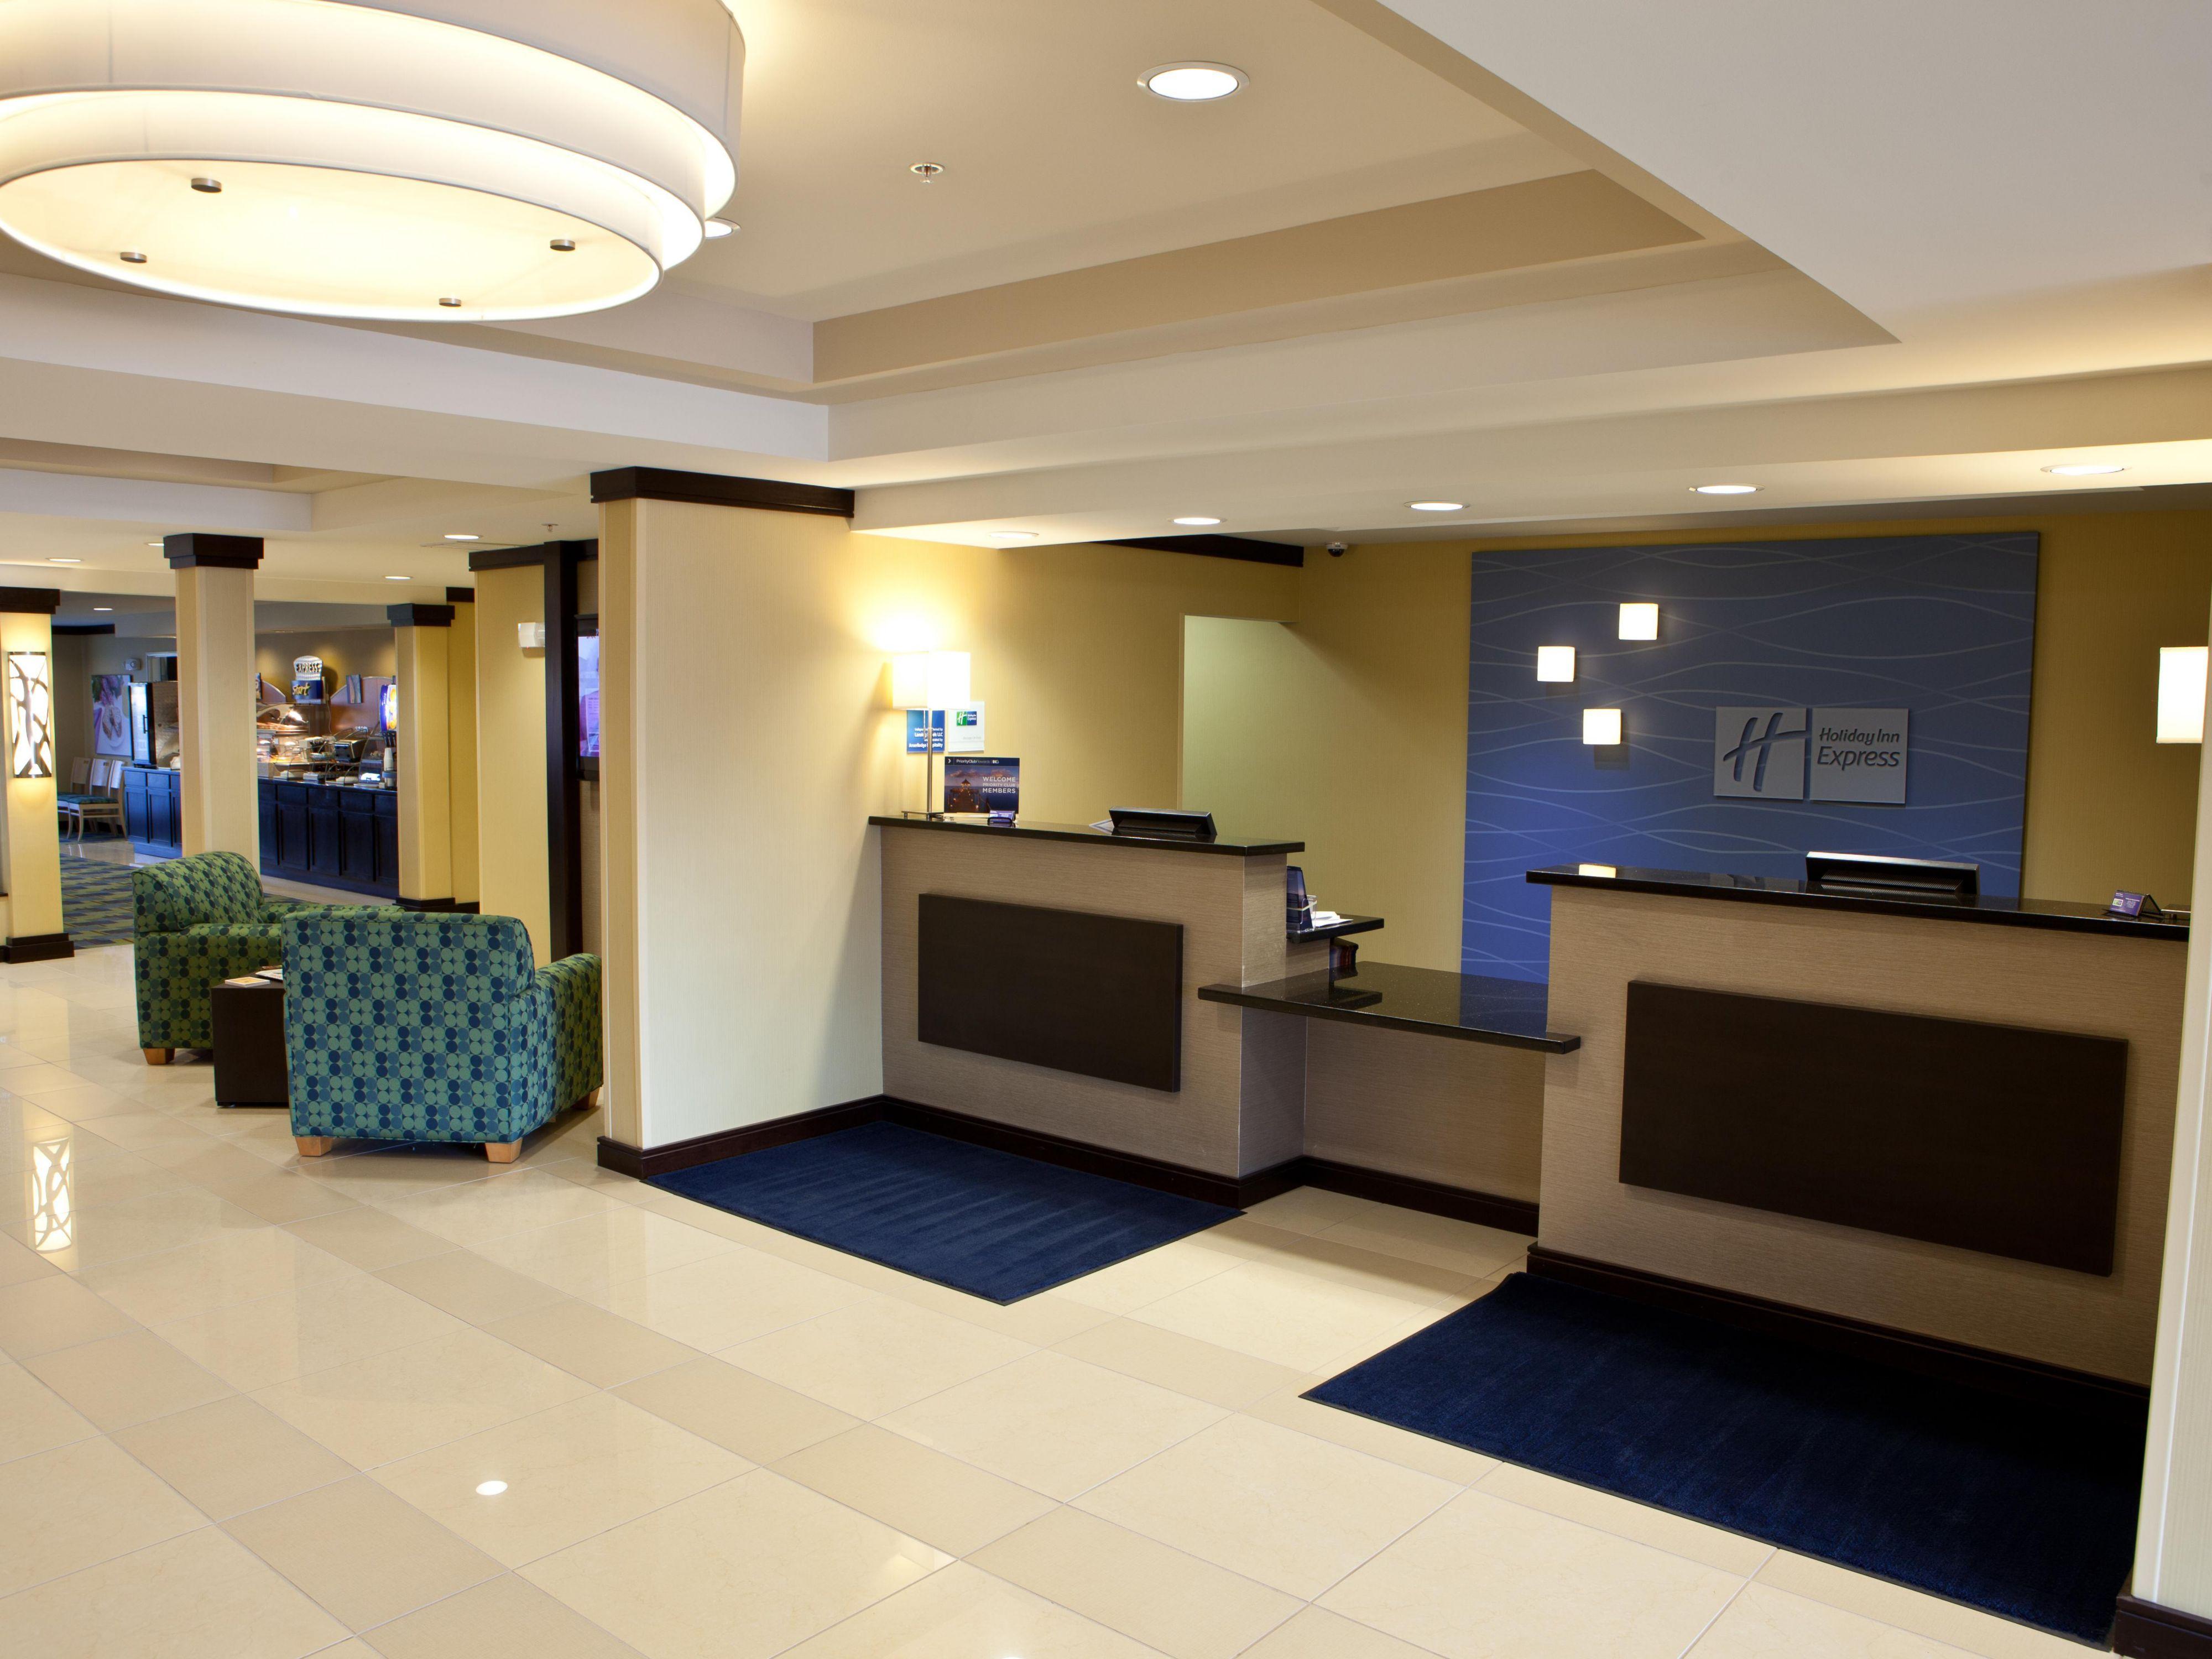 Holiday Inn Express Suites Lansing Dimondale Hotel By IHG